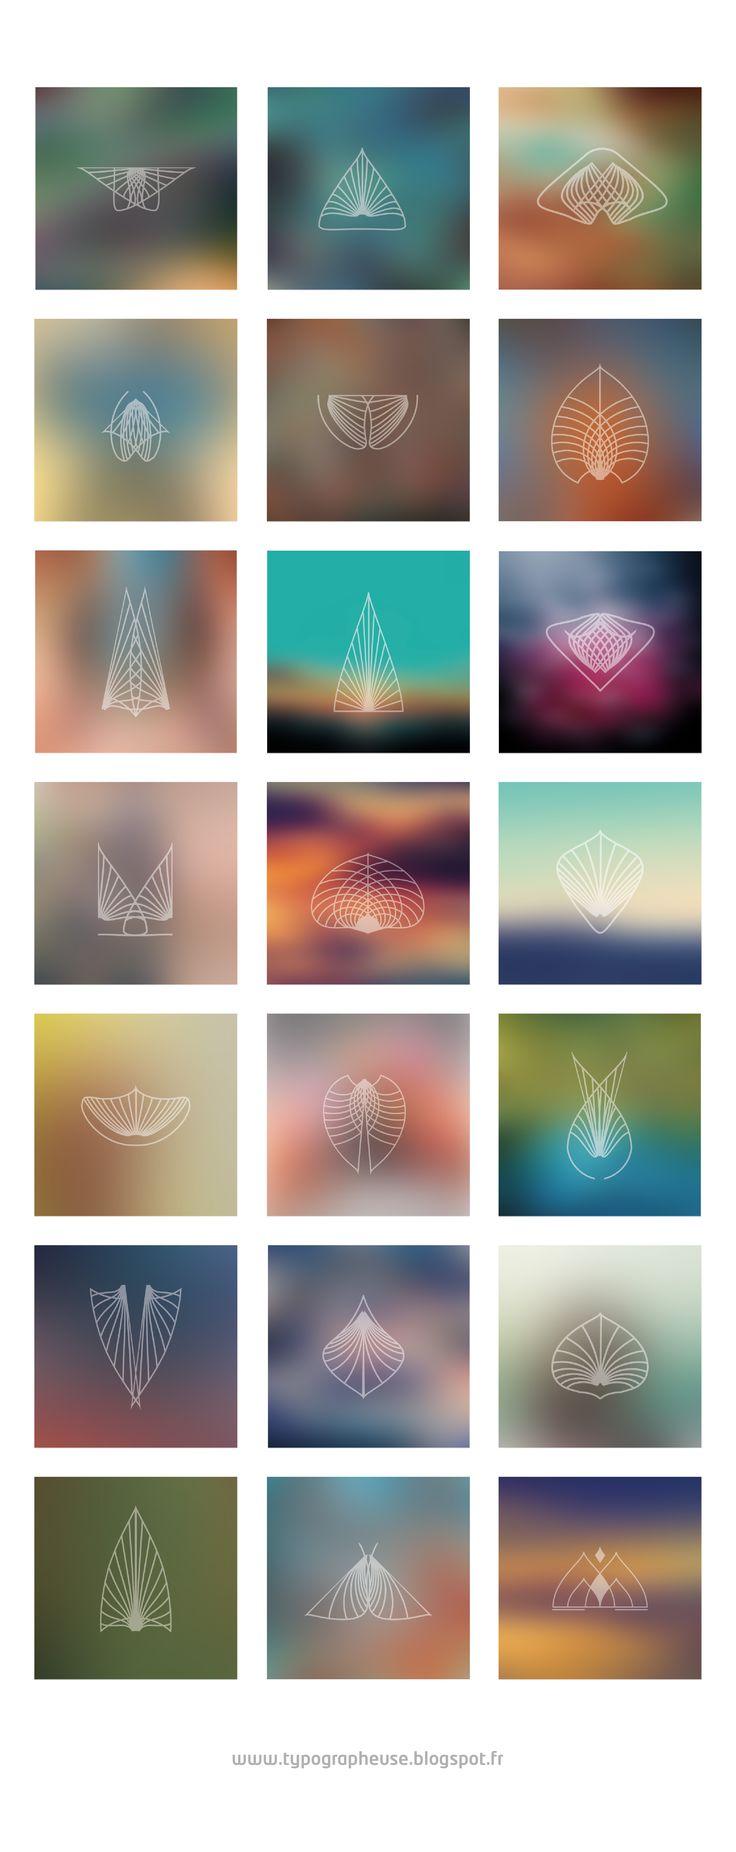 20 Minimalist Geometric Walpapers http://typographeuse.blogspot.fr/2017/06/20-minimalist-geometric-walpapers.html album, blur, chillout, design graphic, feuille; lotus, fleur, geomas, geometric, glyphs, icon, minimaliste, plume, poetic, symbol, tattoo, zen, chillout, album cover